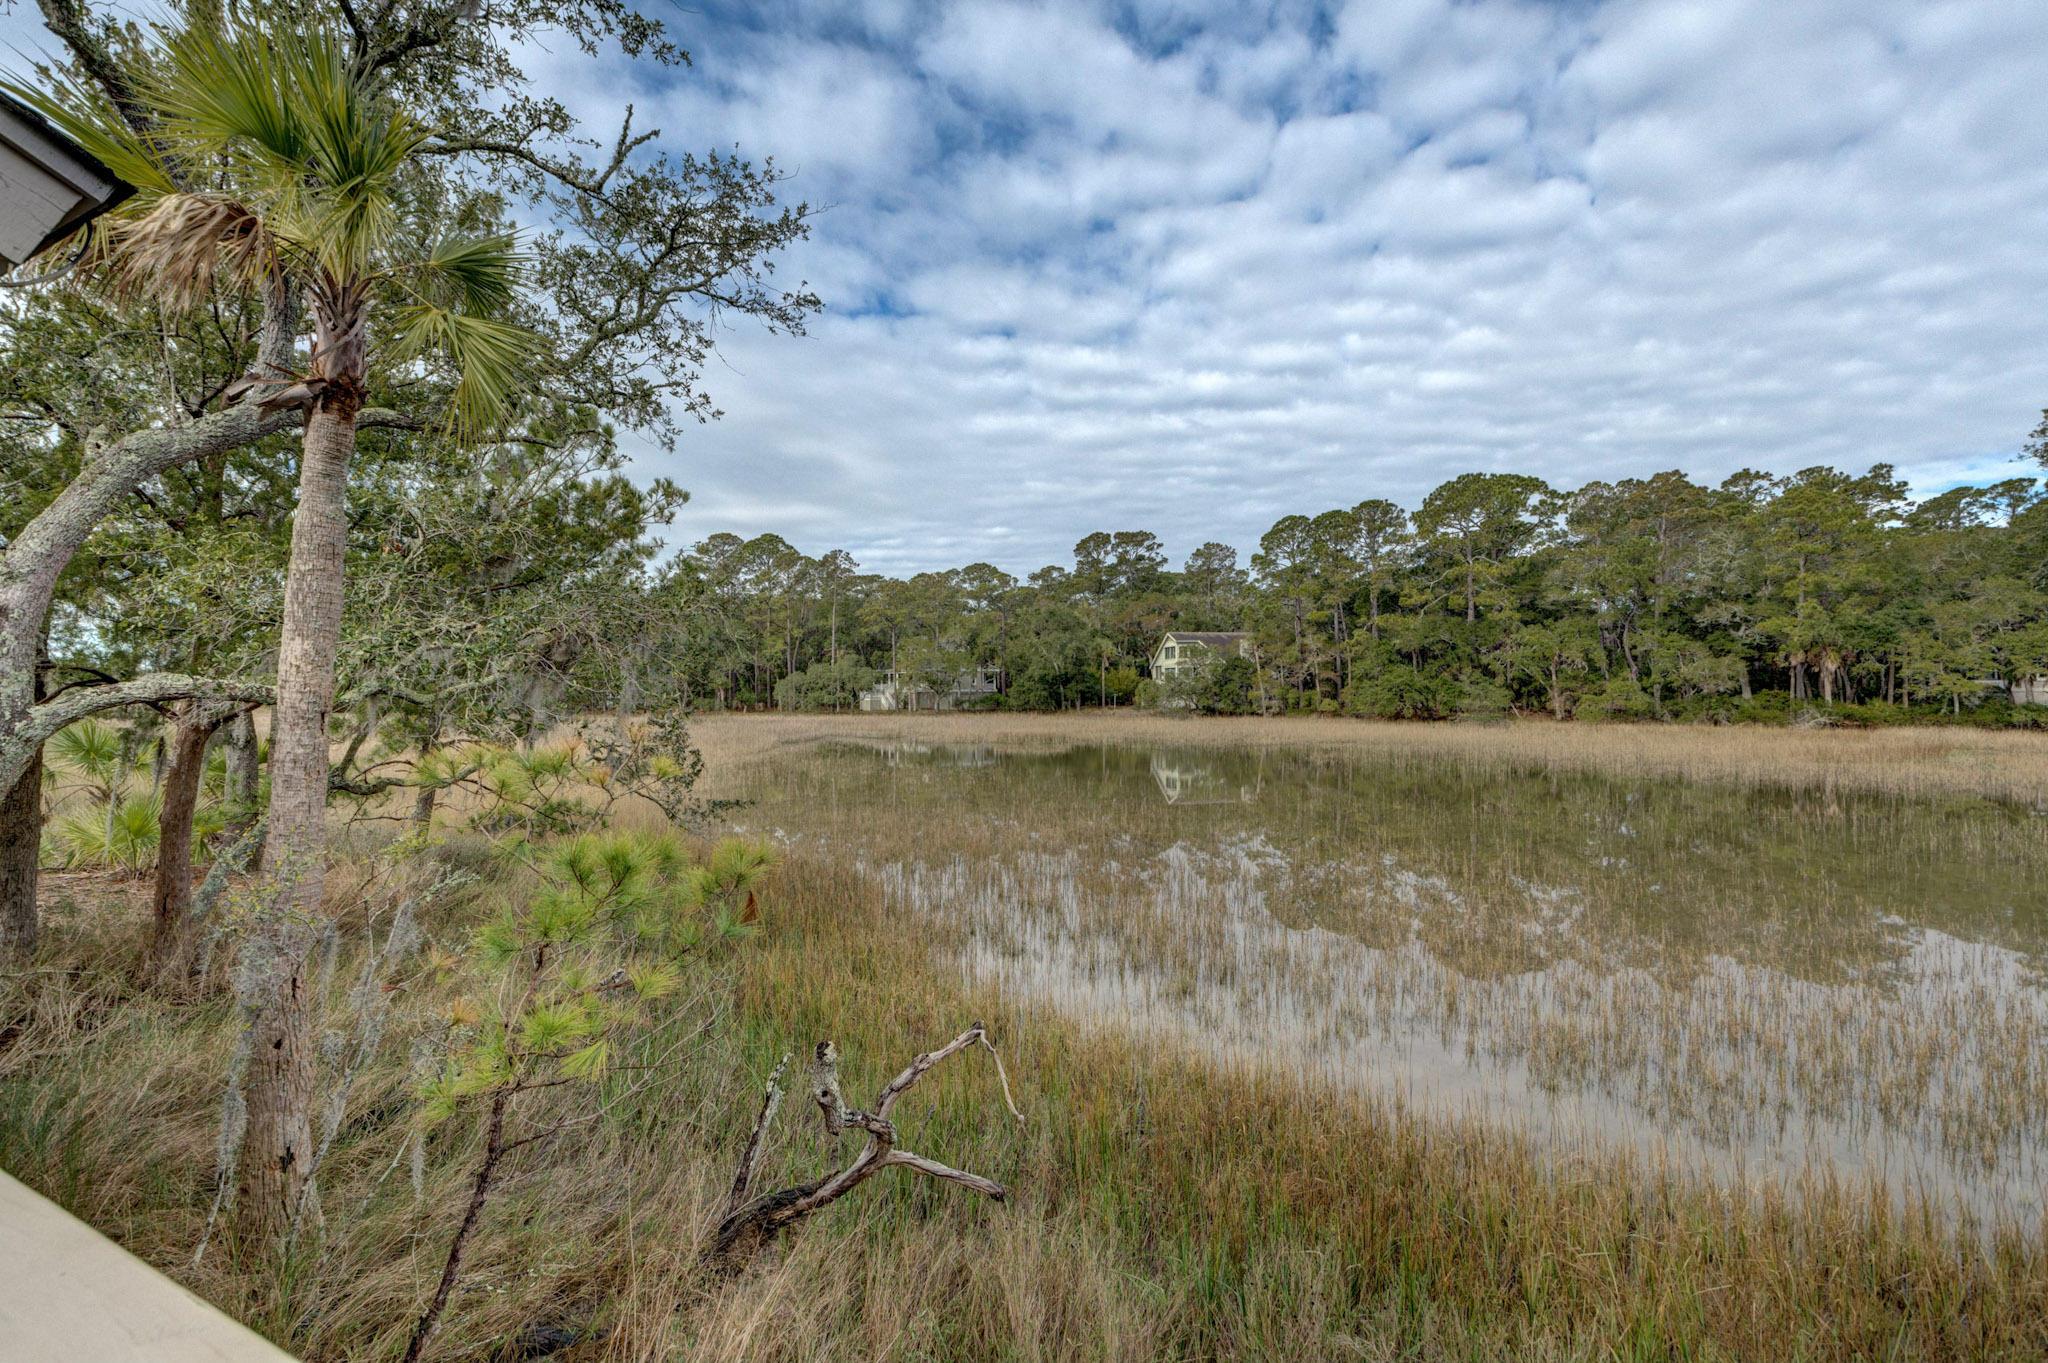 Creek Watch Villas Homes For Sale - 1244 Creek Watch, Johns Island, SC - 12